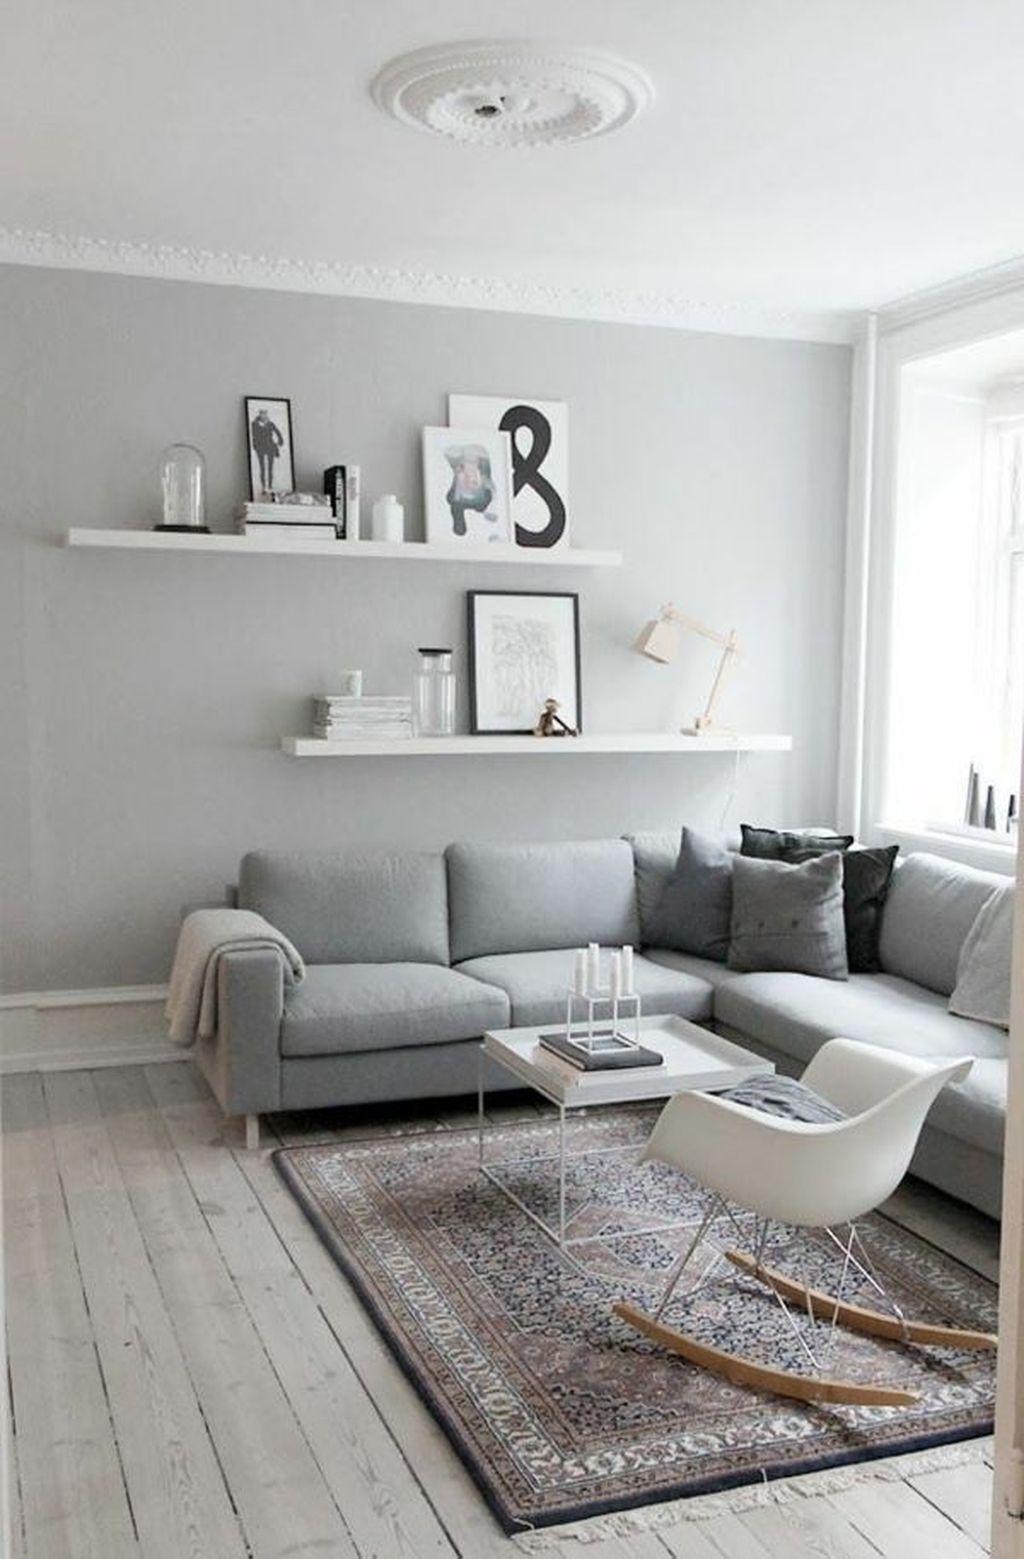 Inspiring Small Living Room Decor Ideas 31